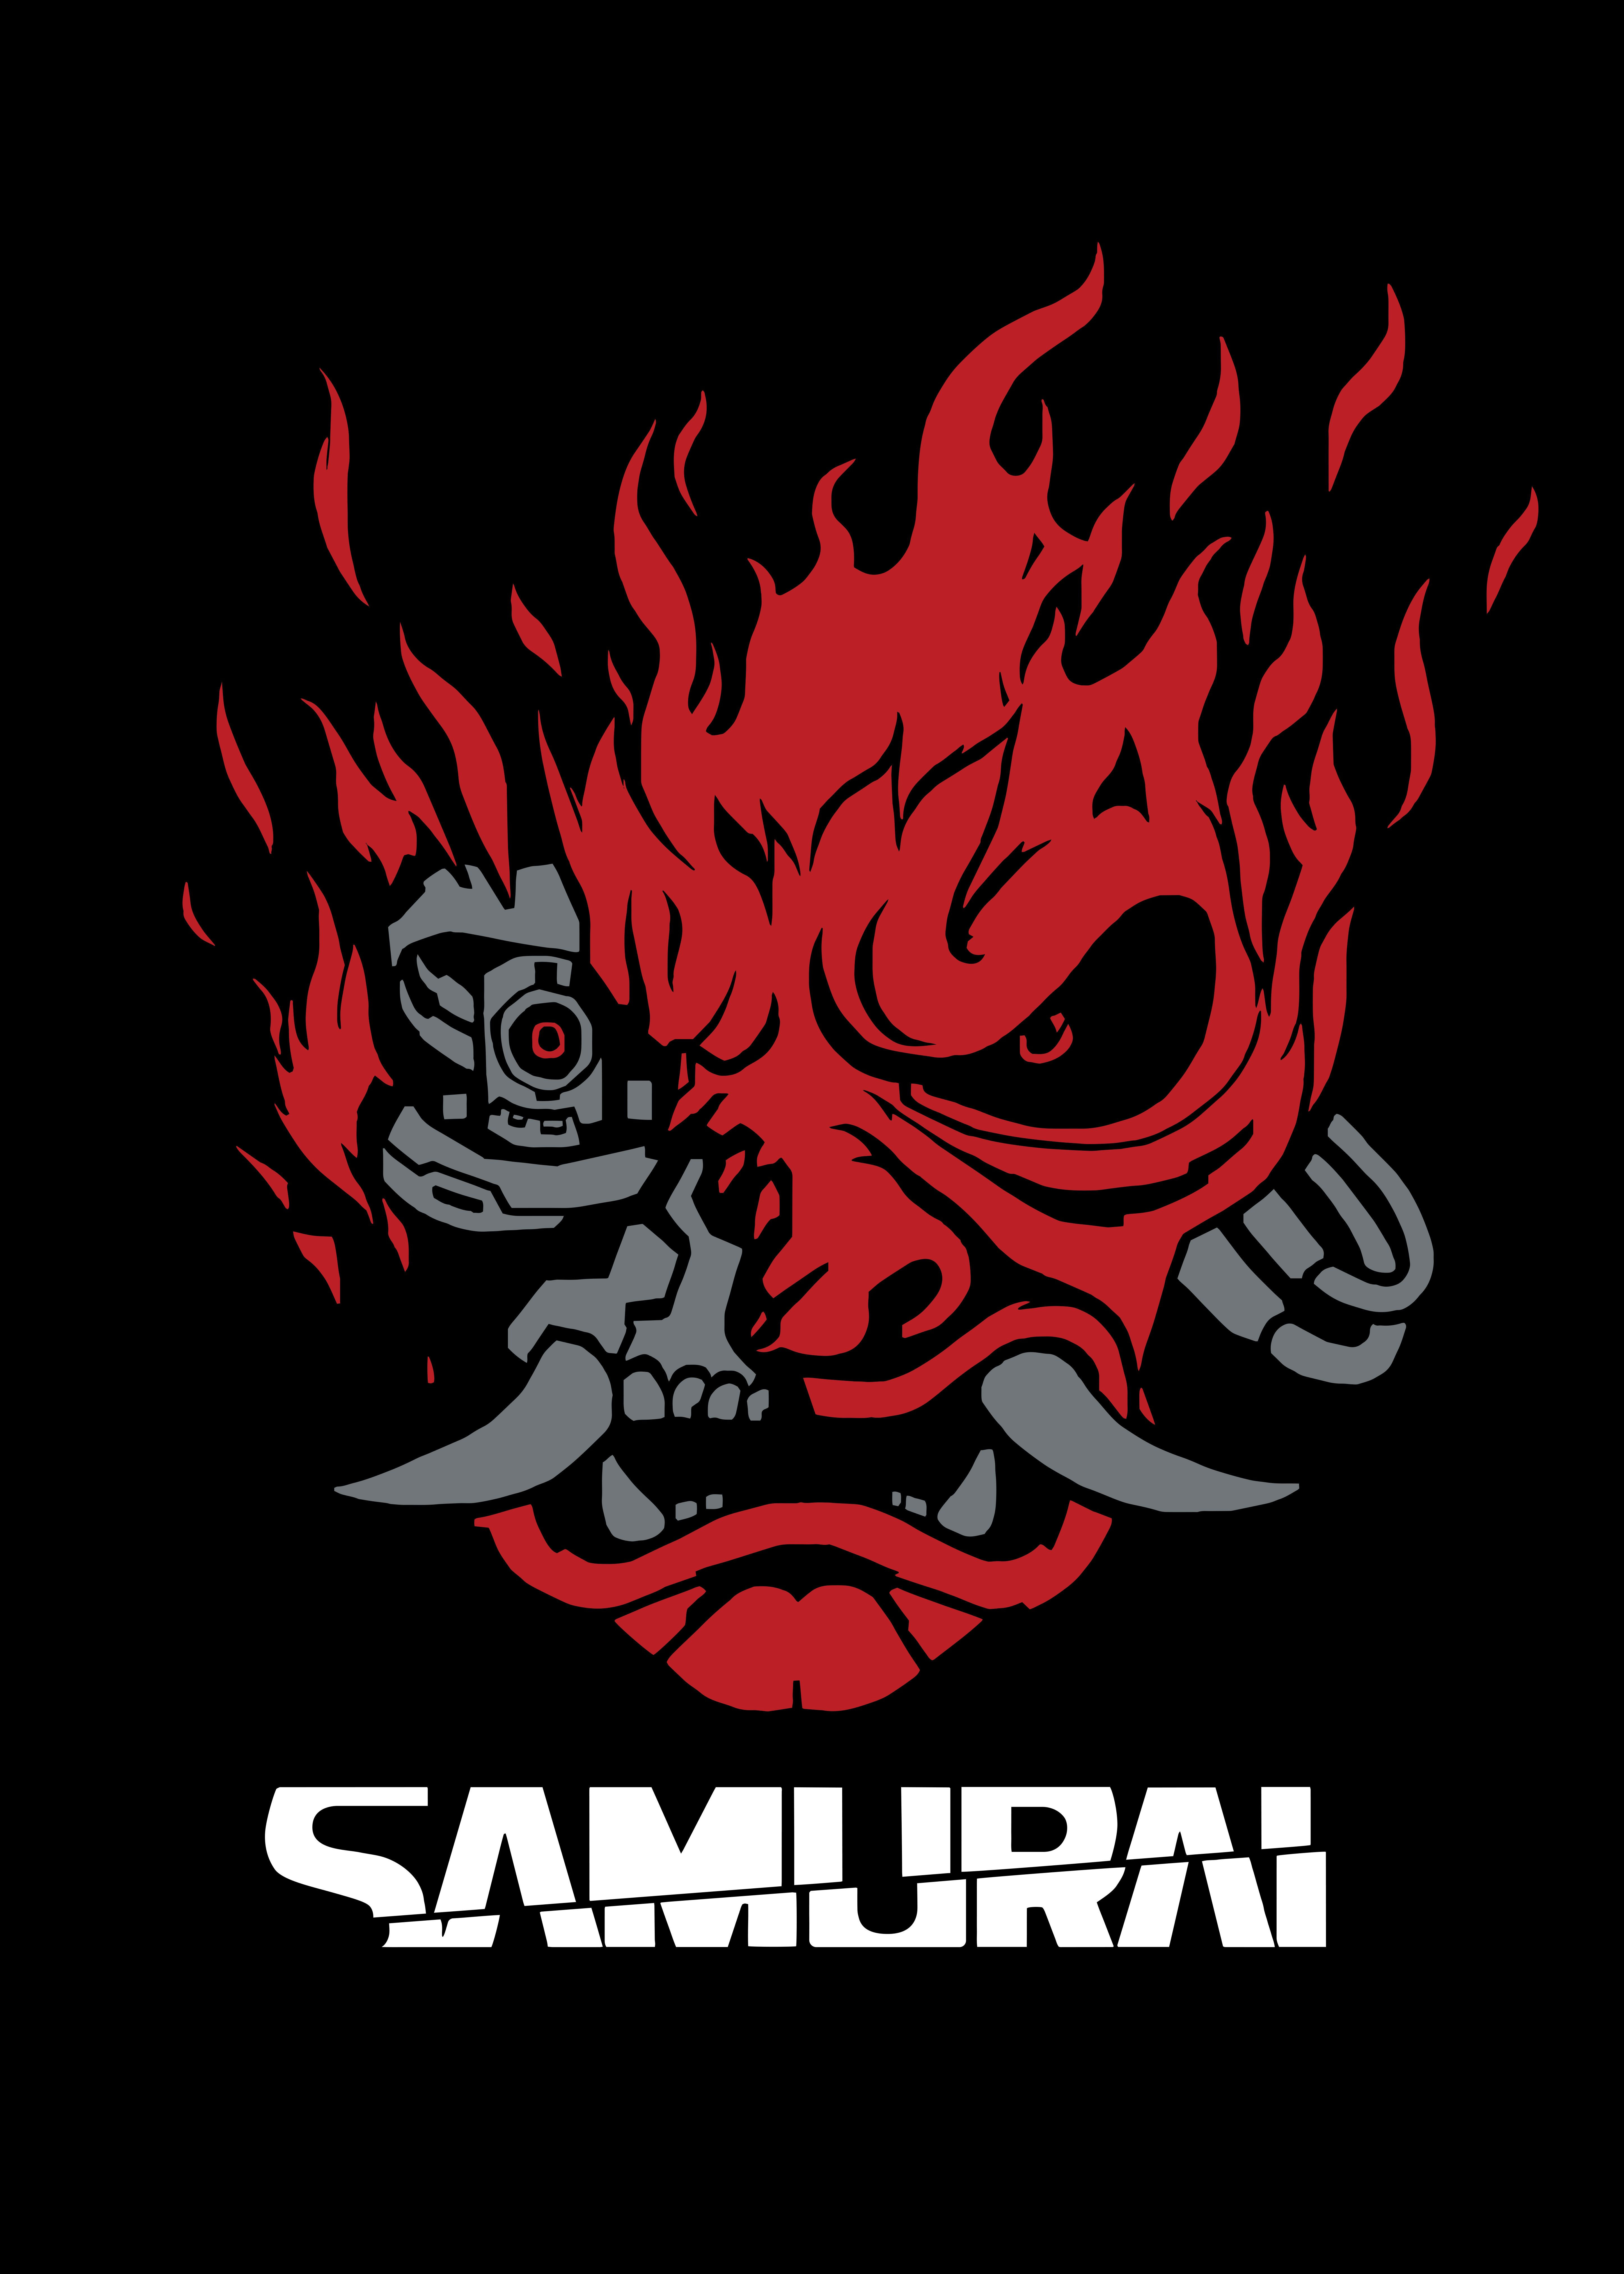 Samurai Metal Poster Print Cyberpunk 2077 Displate In 2020 Cyberpunk 2077 Fantasy Posters Cyberpunk Art